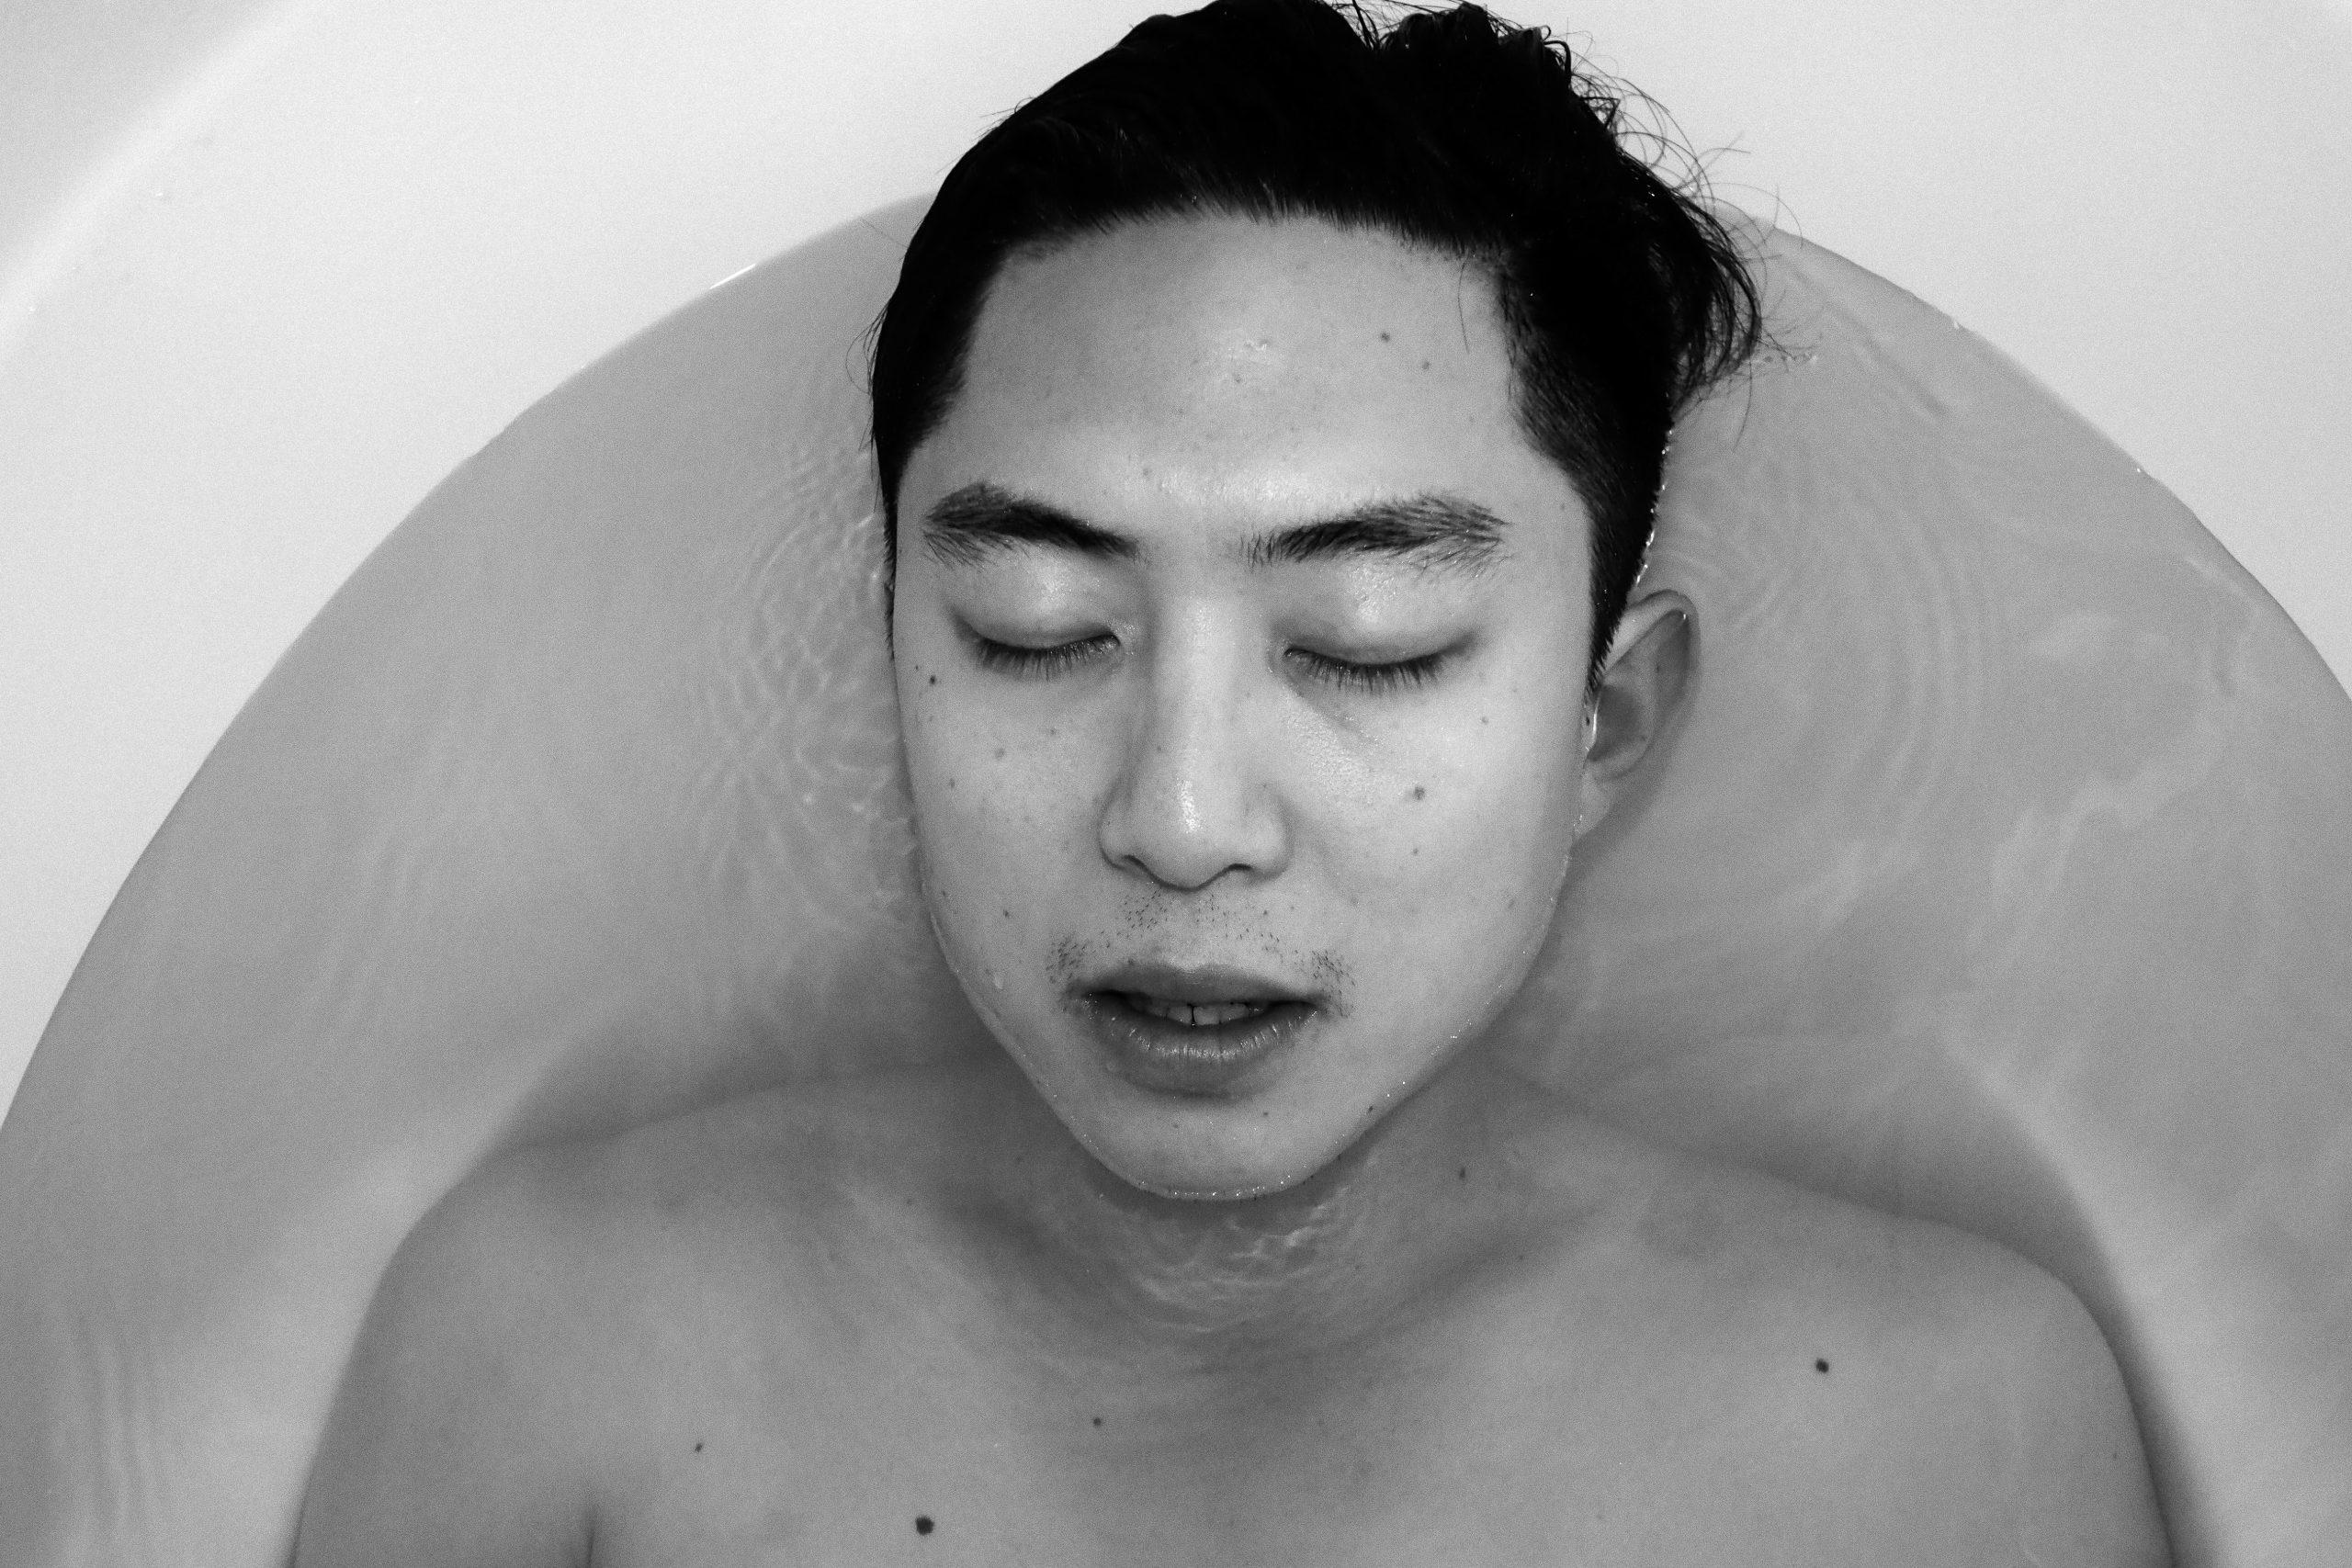 selfie ERIC KIM memento mori tub